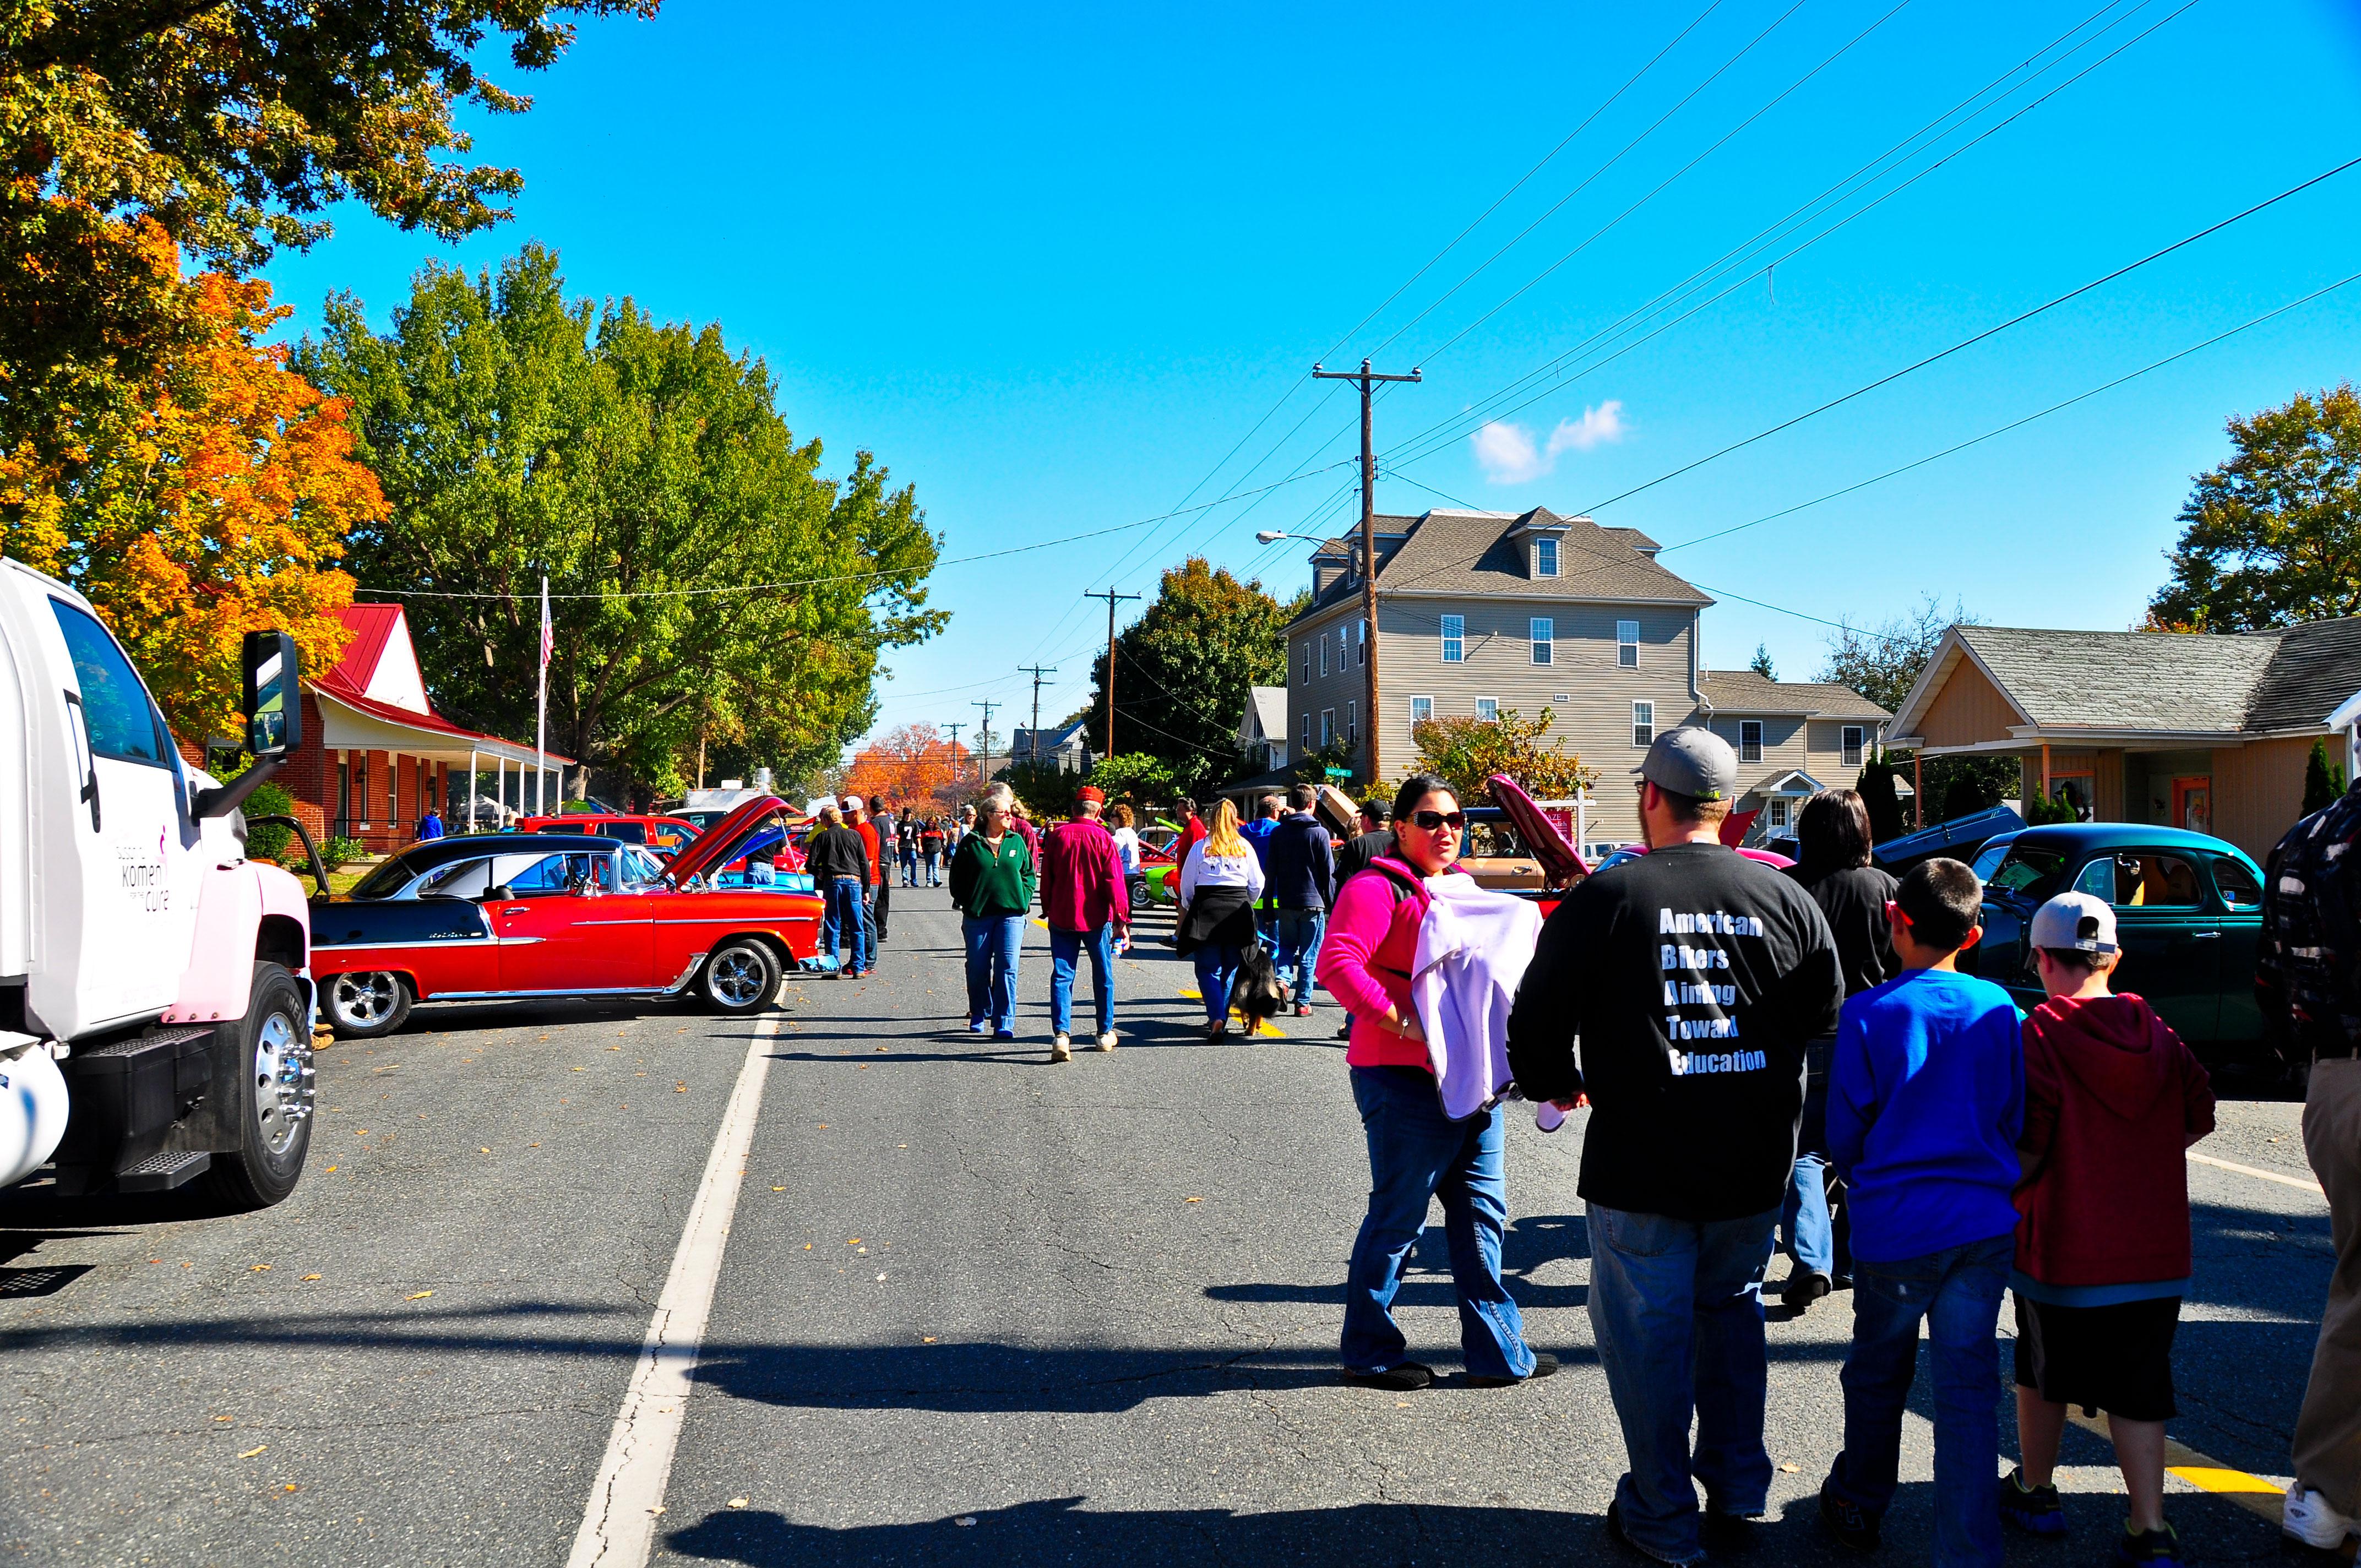 Family Fun Ridgely Car Show - Ridgely car show